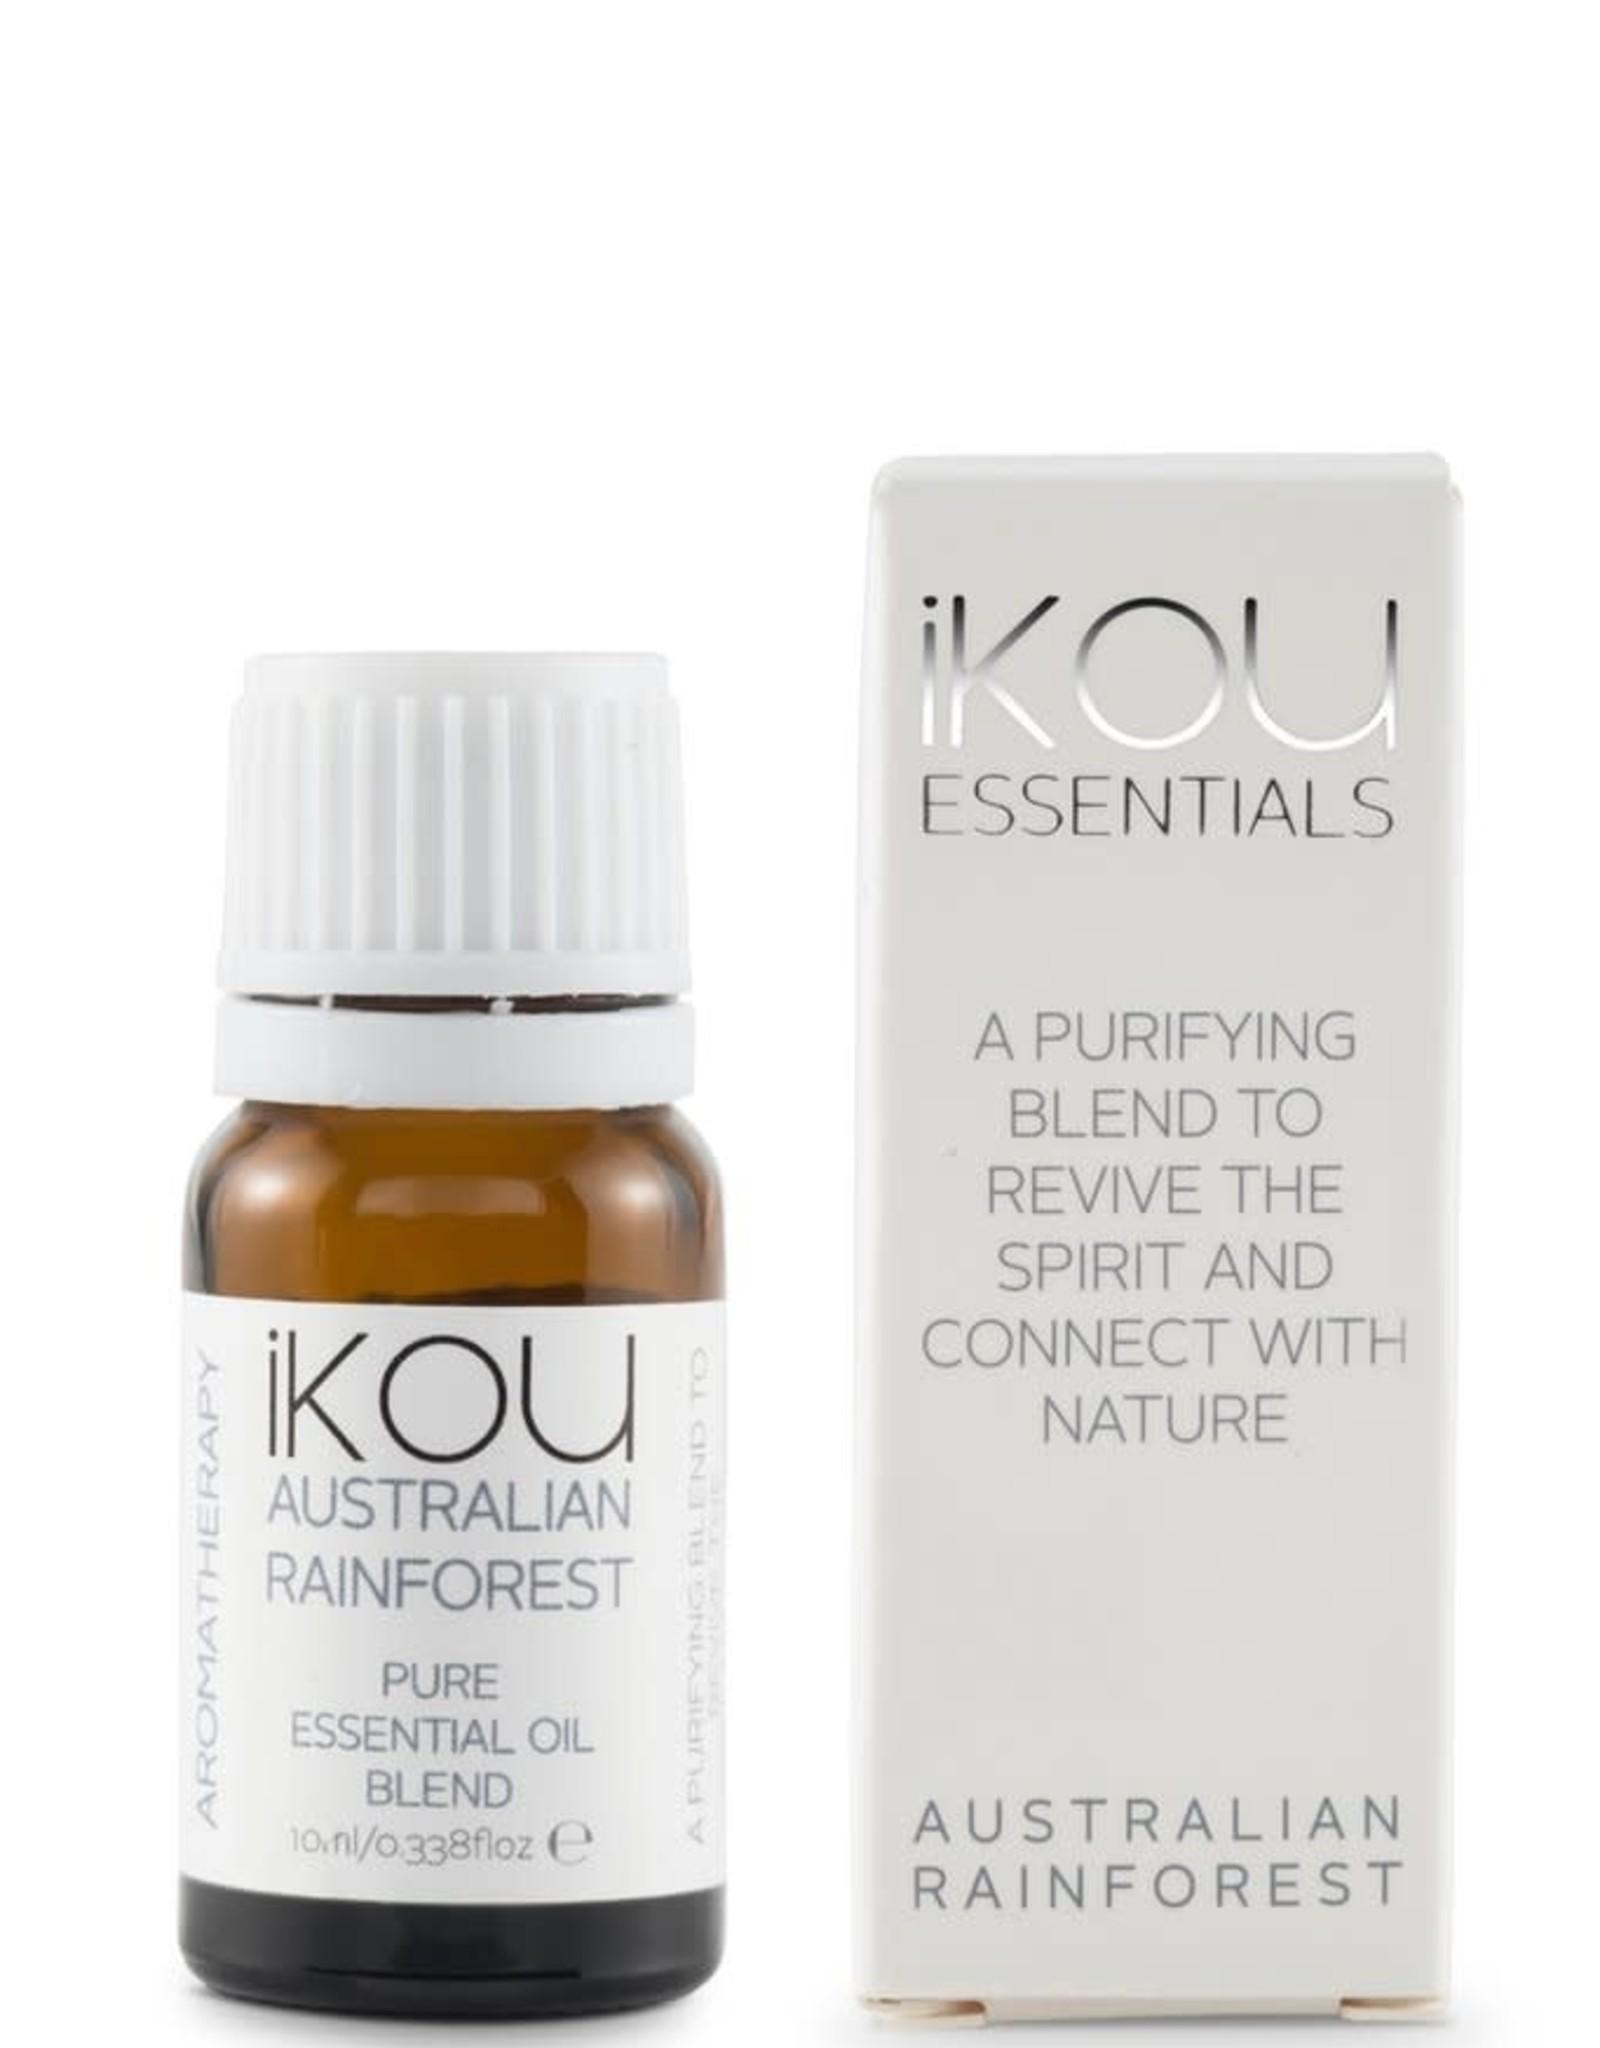 AUSTRALIAN RAINFOREST Essential Oil